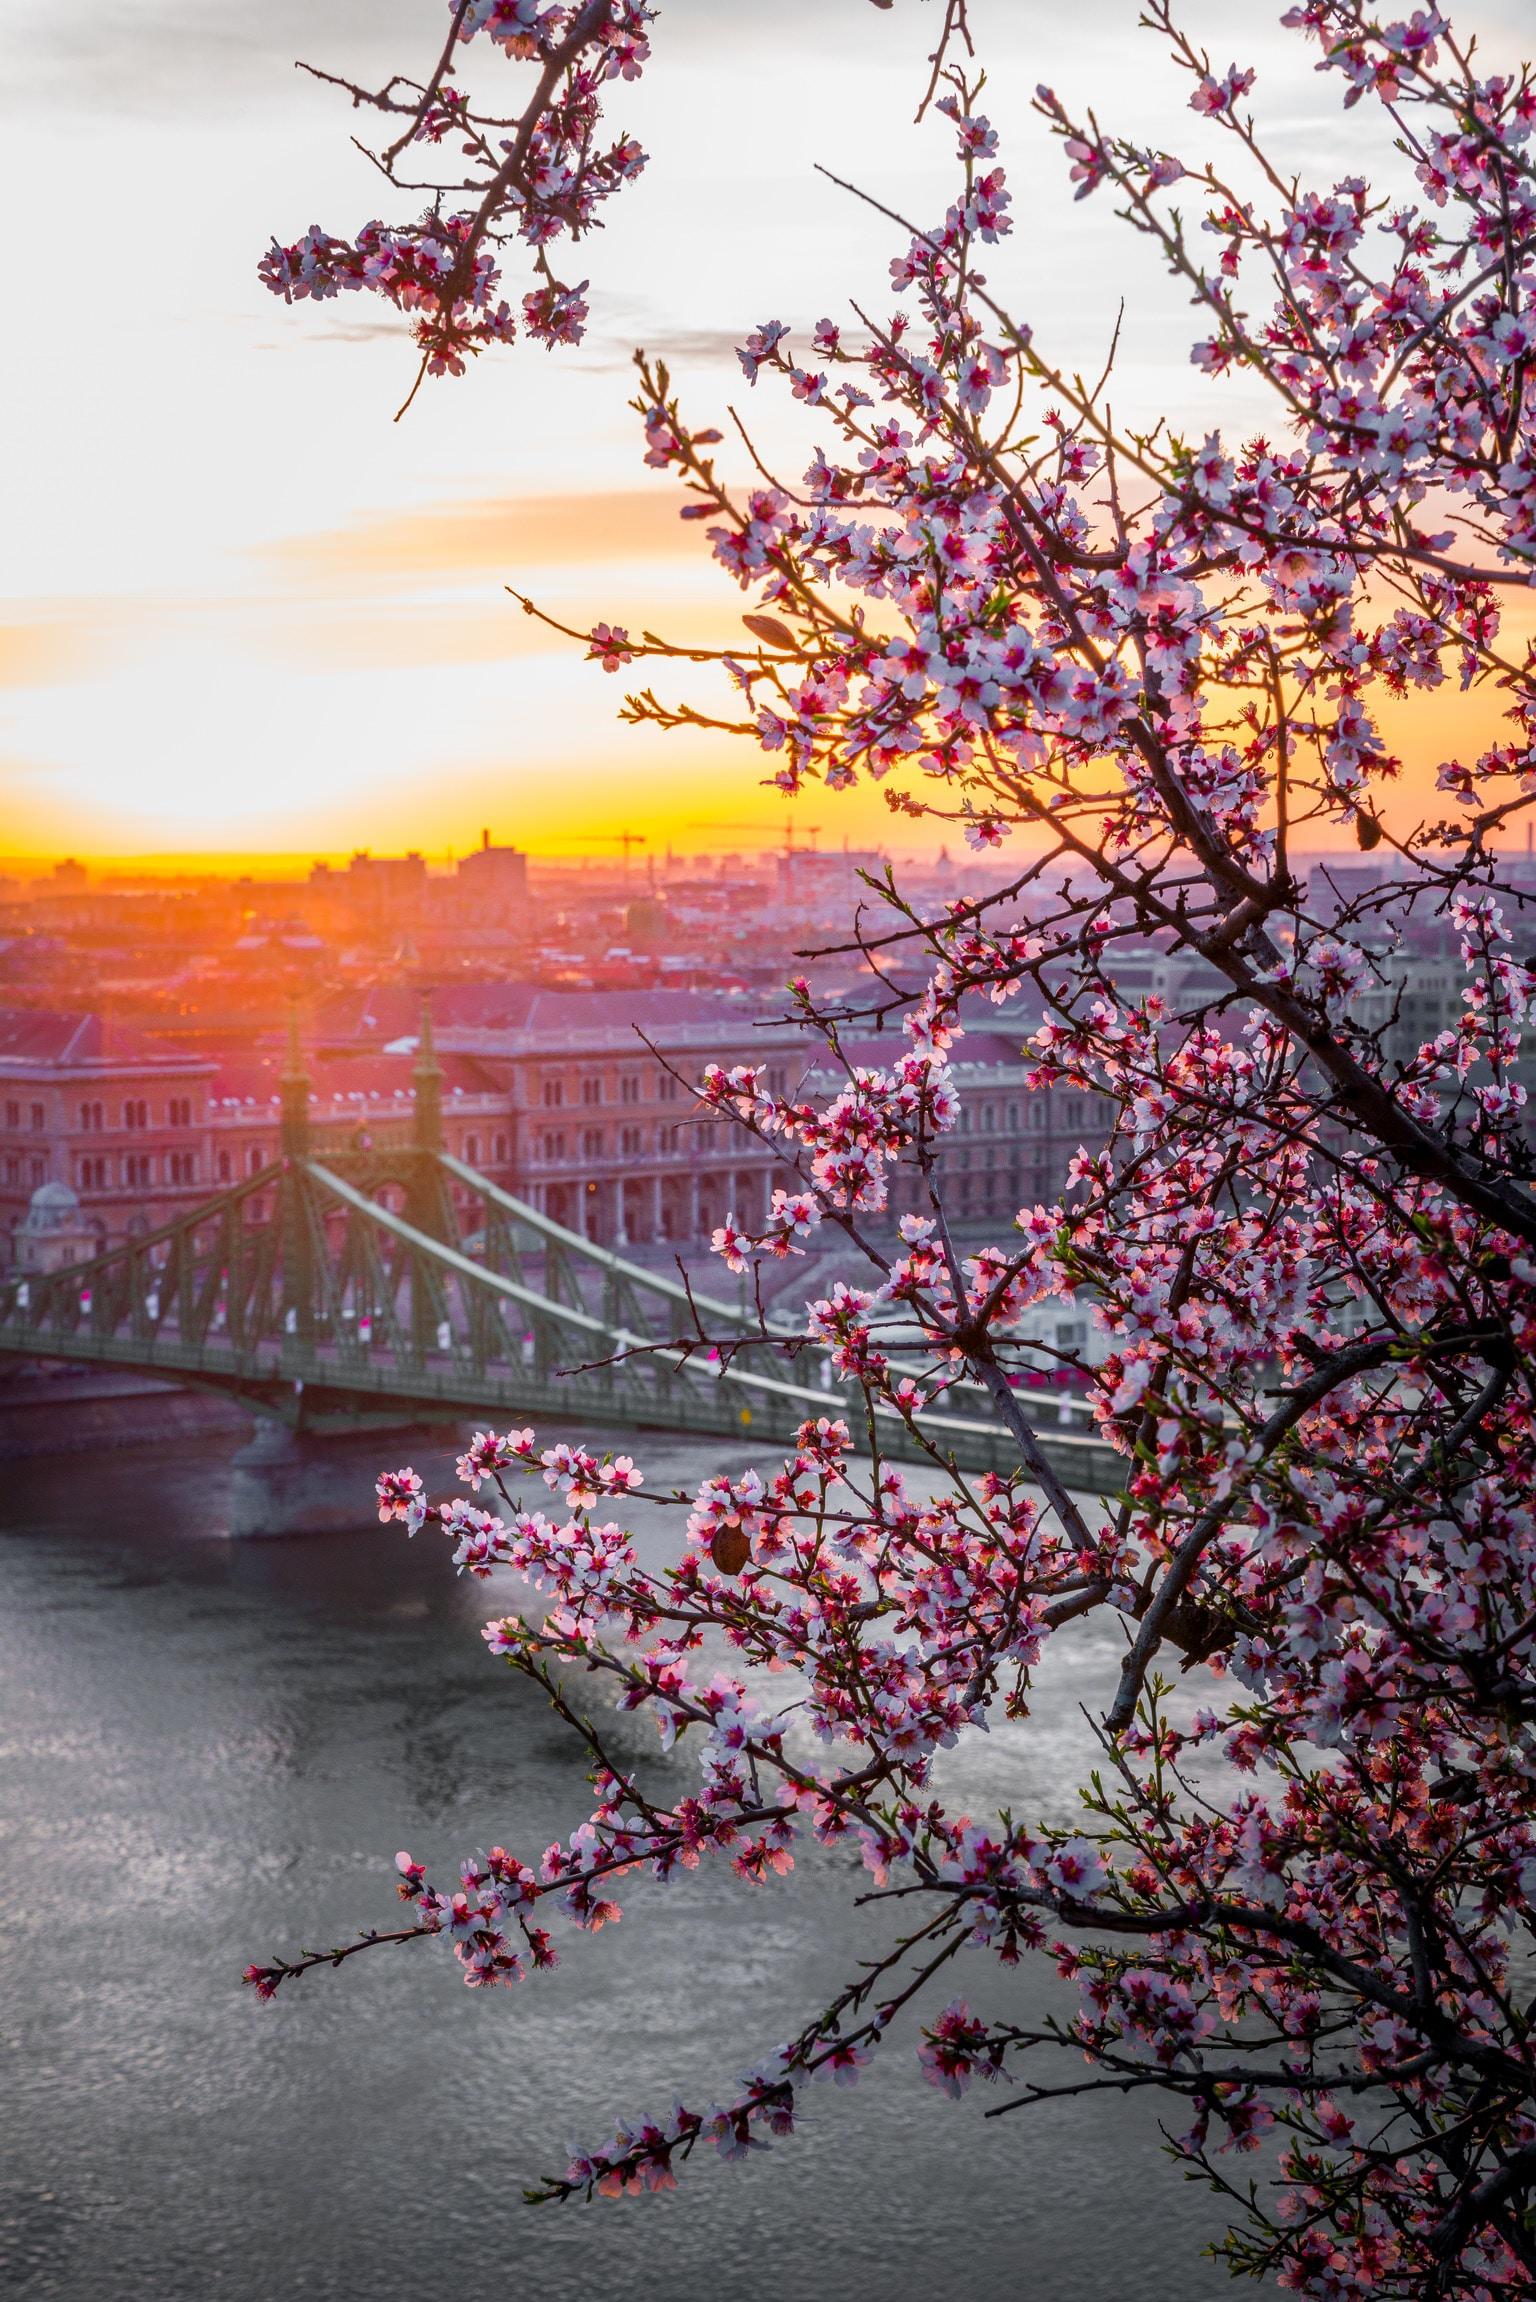 landscape photography of bridge